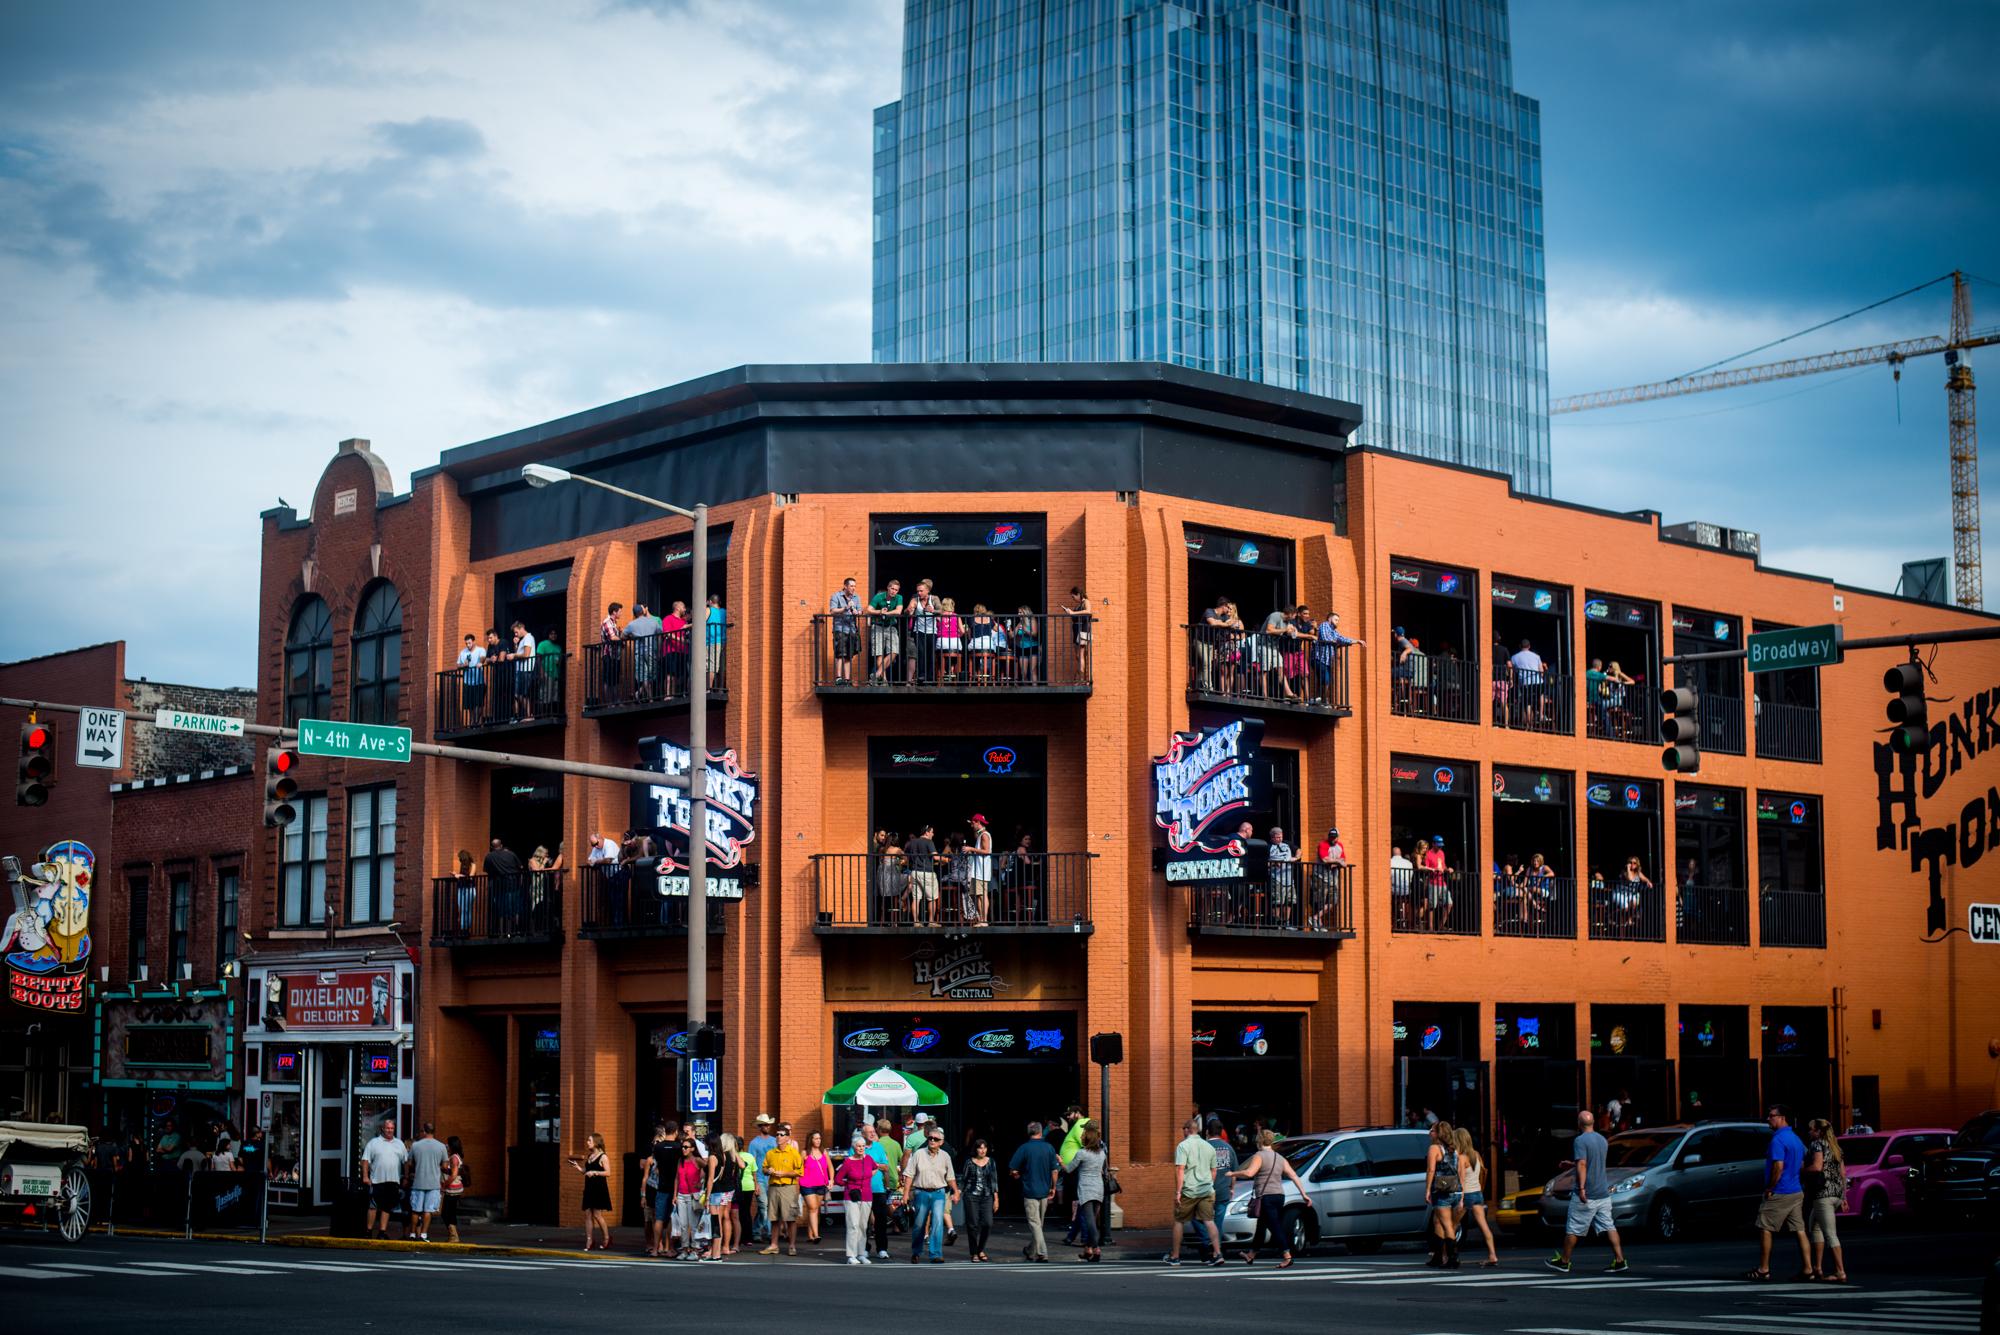 Nashville_092315-84.jpg